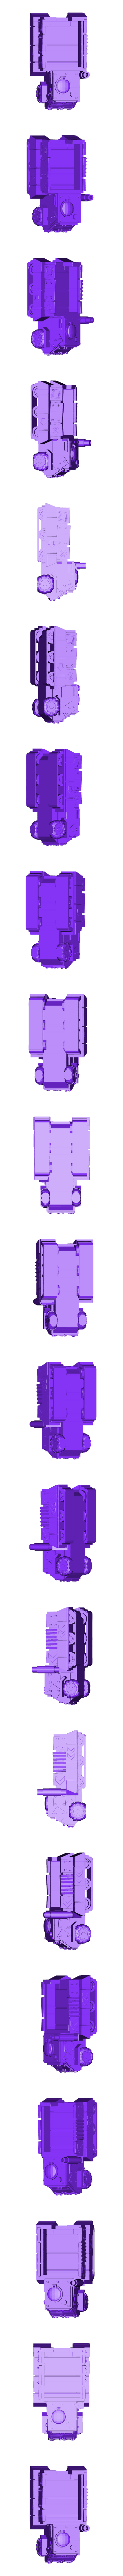 WarTruckBaseless.stl Download free STL file  15mm Sci-Fi Space Junker War Truck (baseless remix) • 3D printing object, Dutchmogul